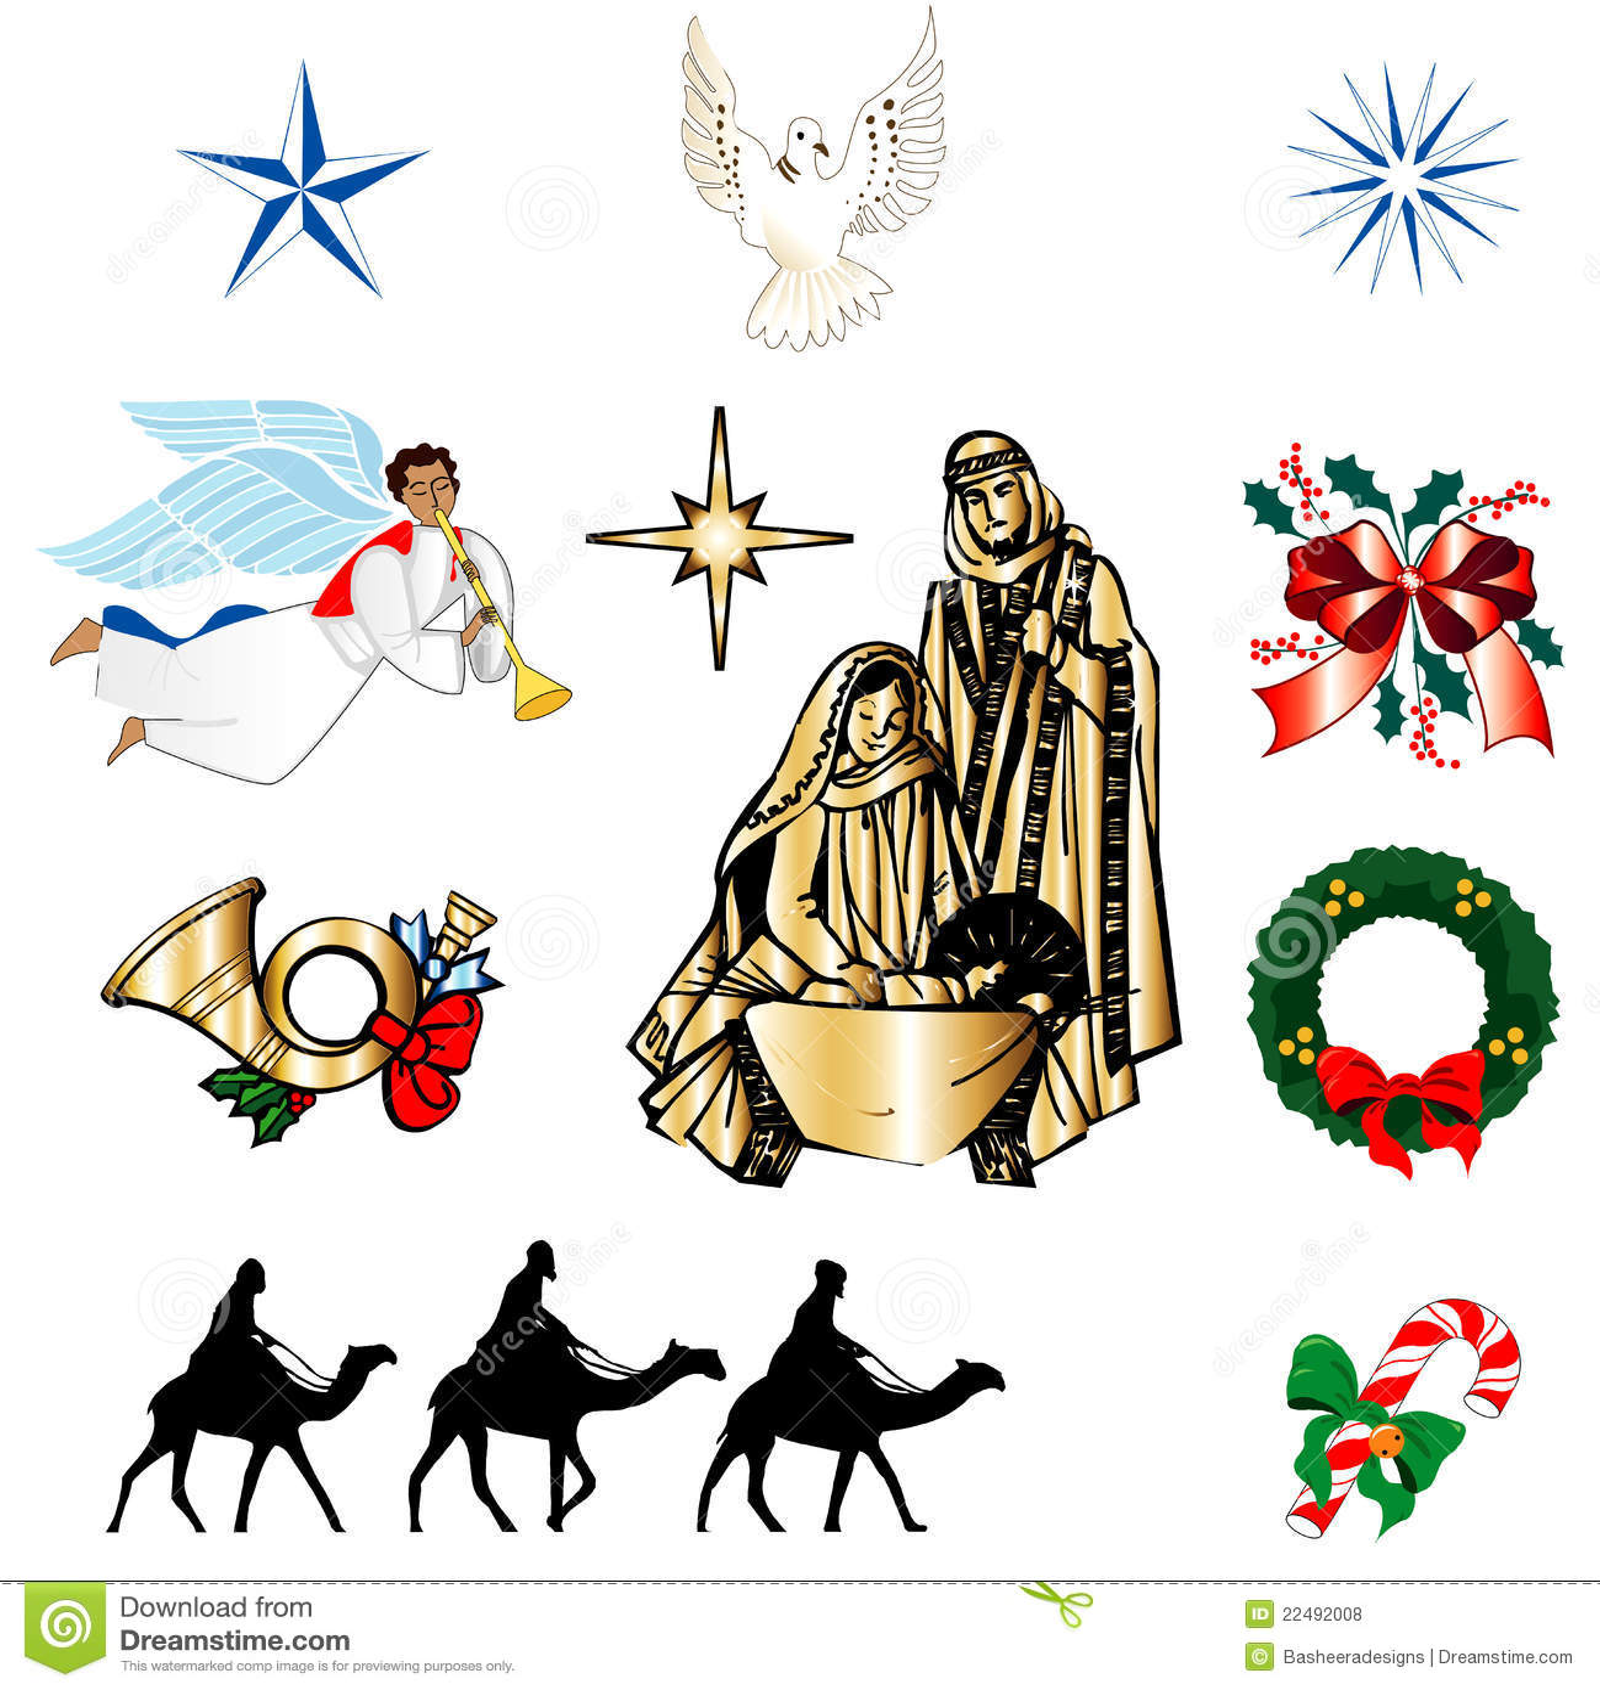 Christian Christmas Icons Royalty Free Stock Photos ... (1300 x 1390 Pixel)